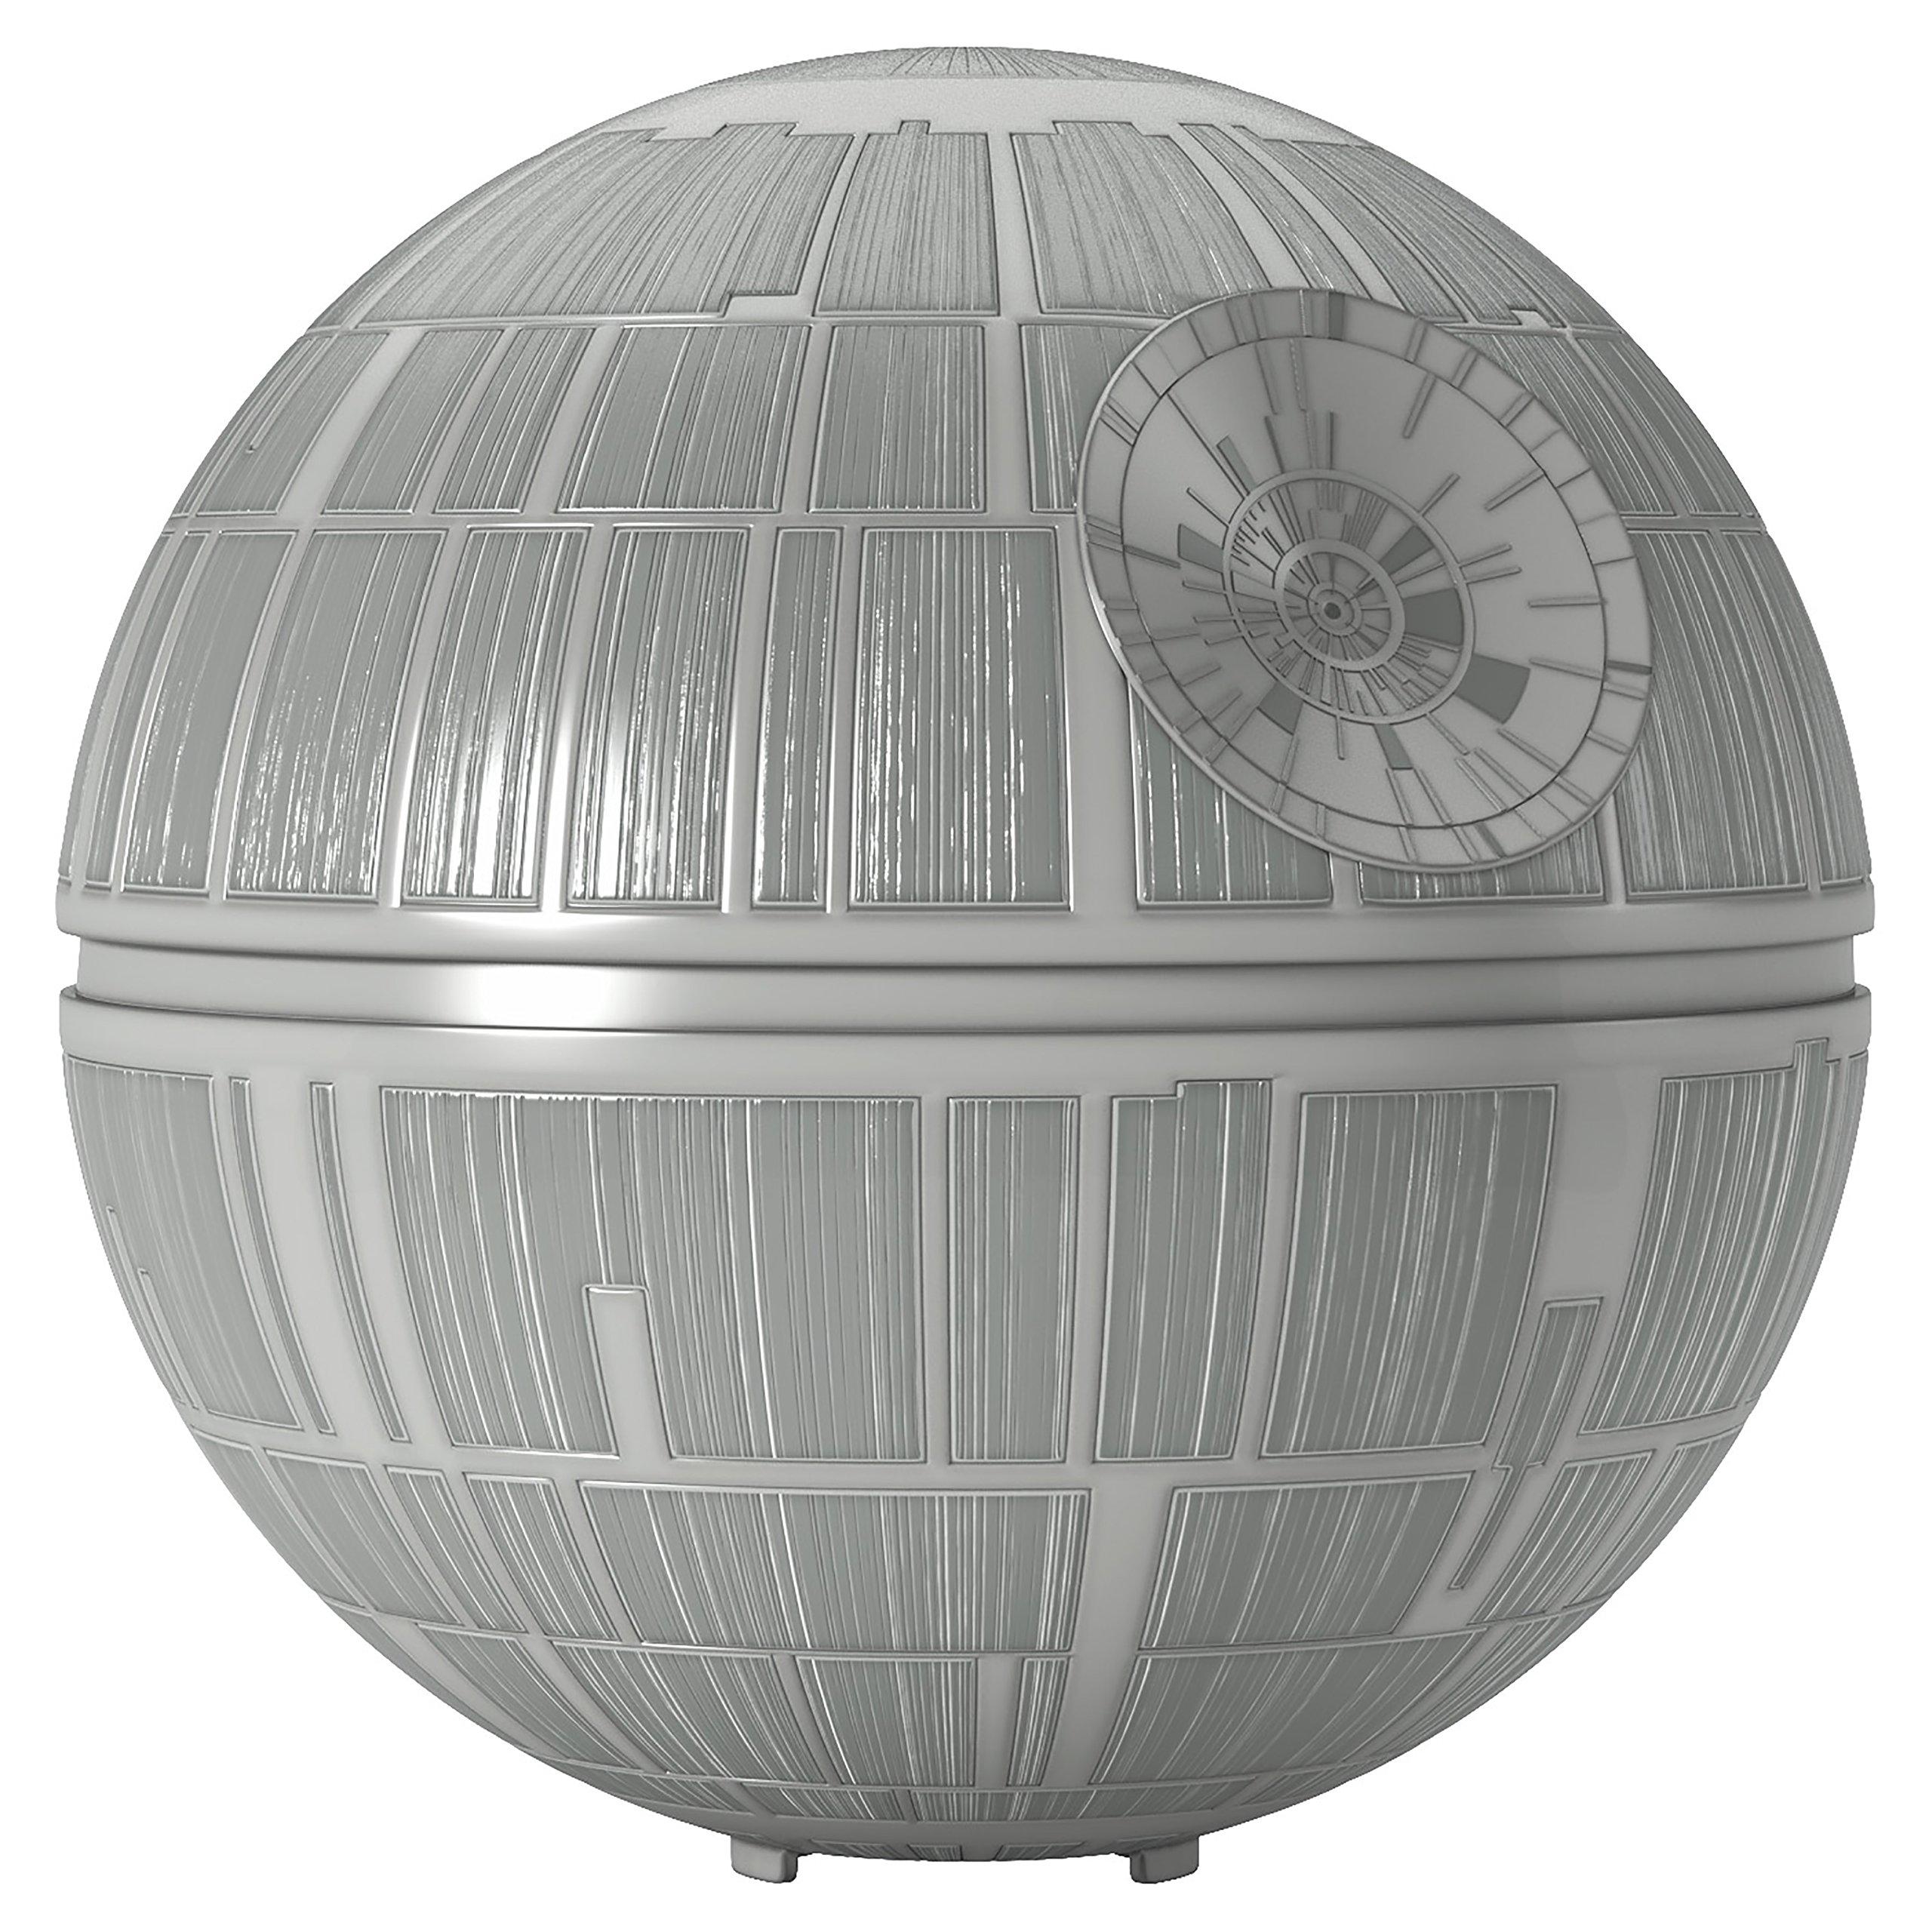 Hallmark Keepsake 2016 Star Wars Death Star Tree Topper With Lights